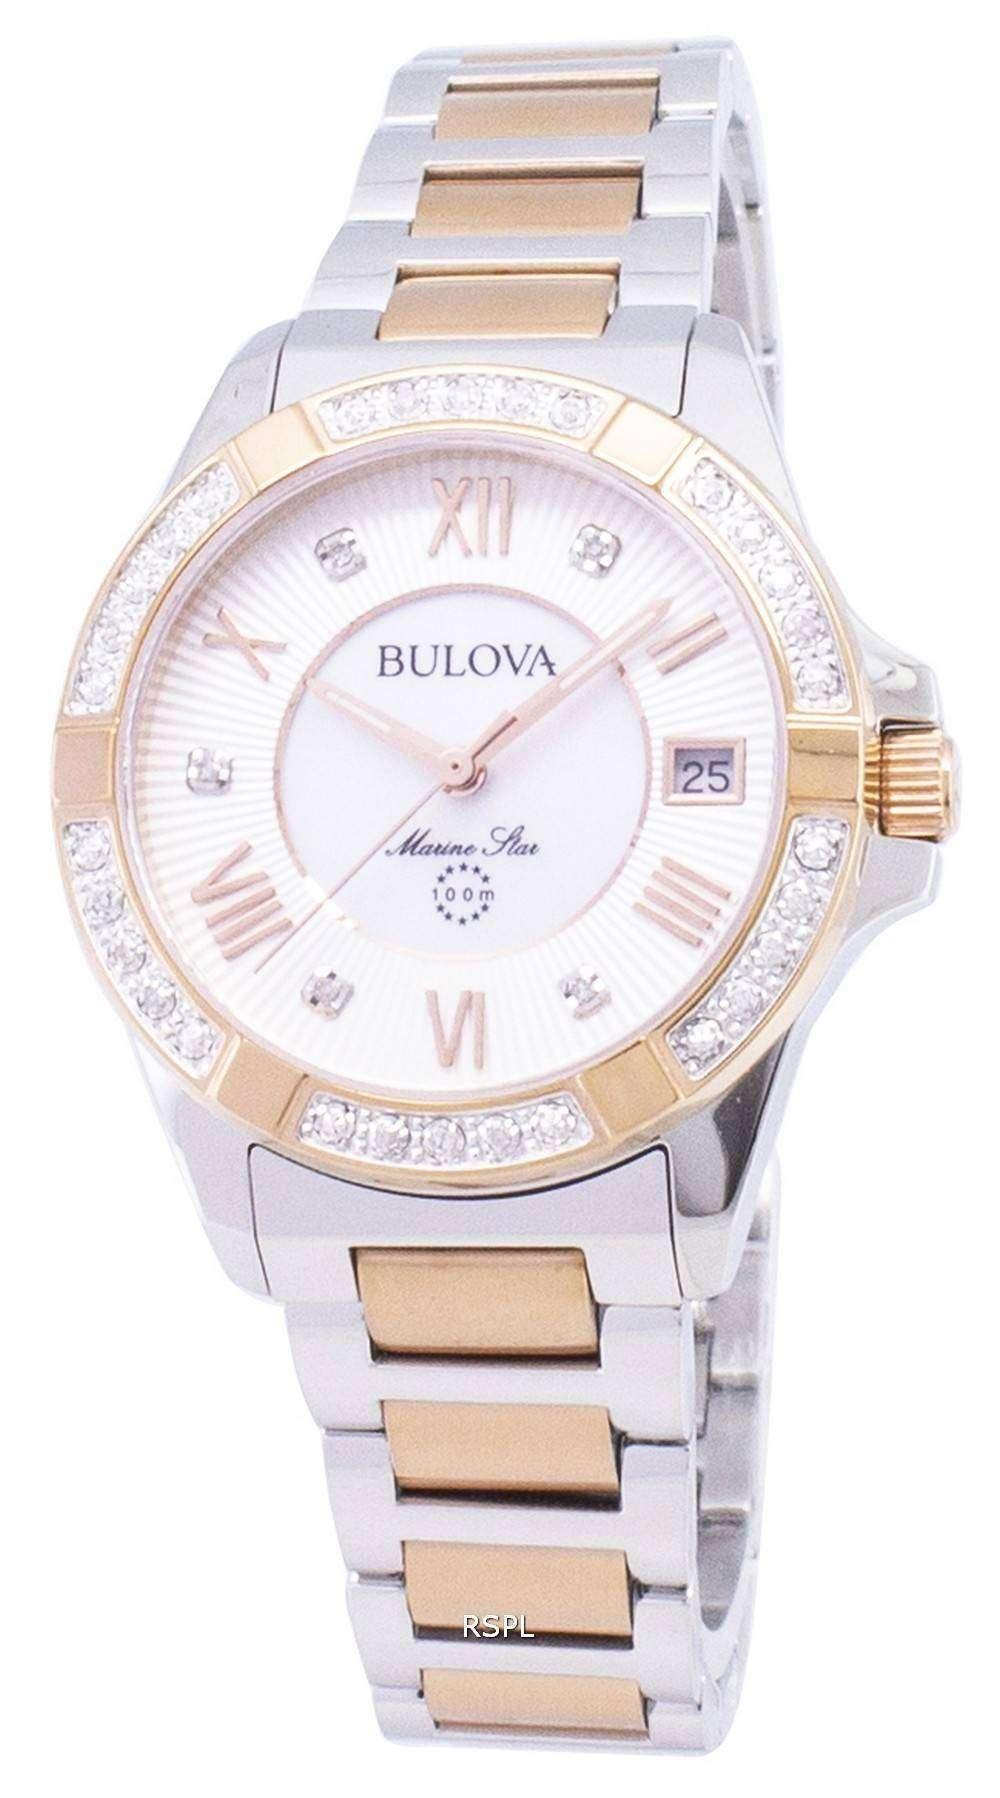 70283d77188 Bulova Marine Star 98R234 Diamond Accent Quartz Women s Watch ...